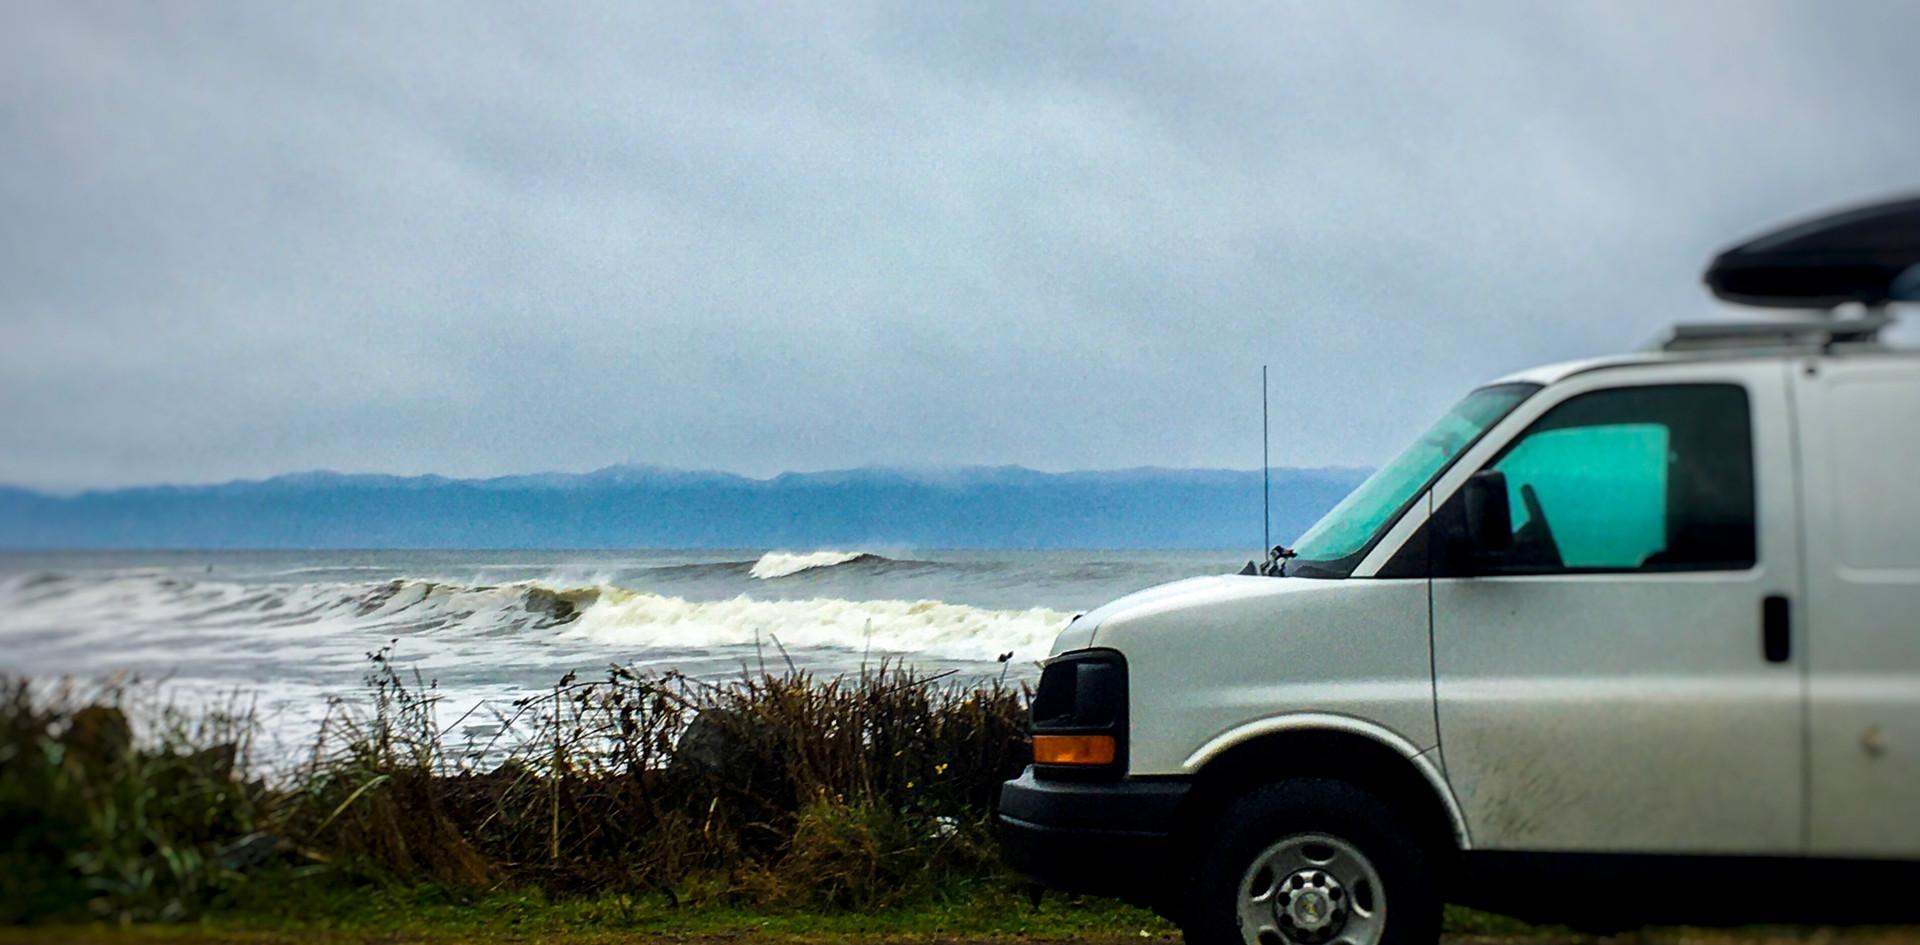 regarder les surfer du camping-car